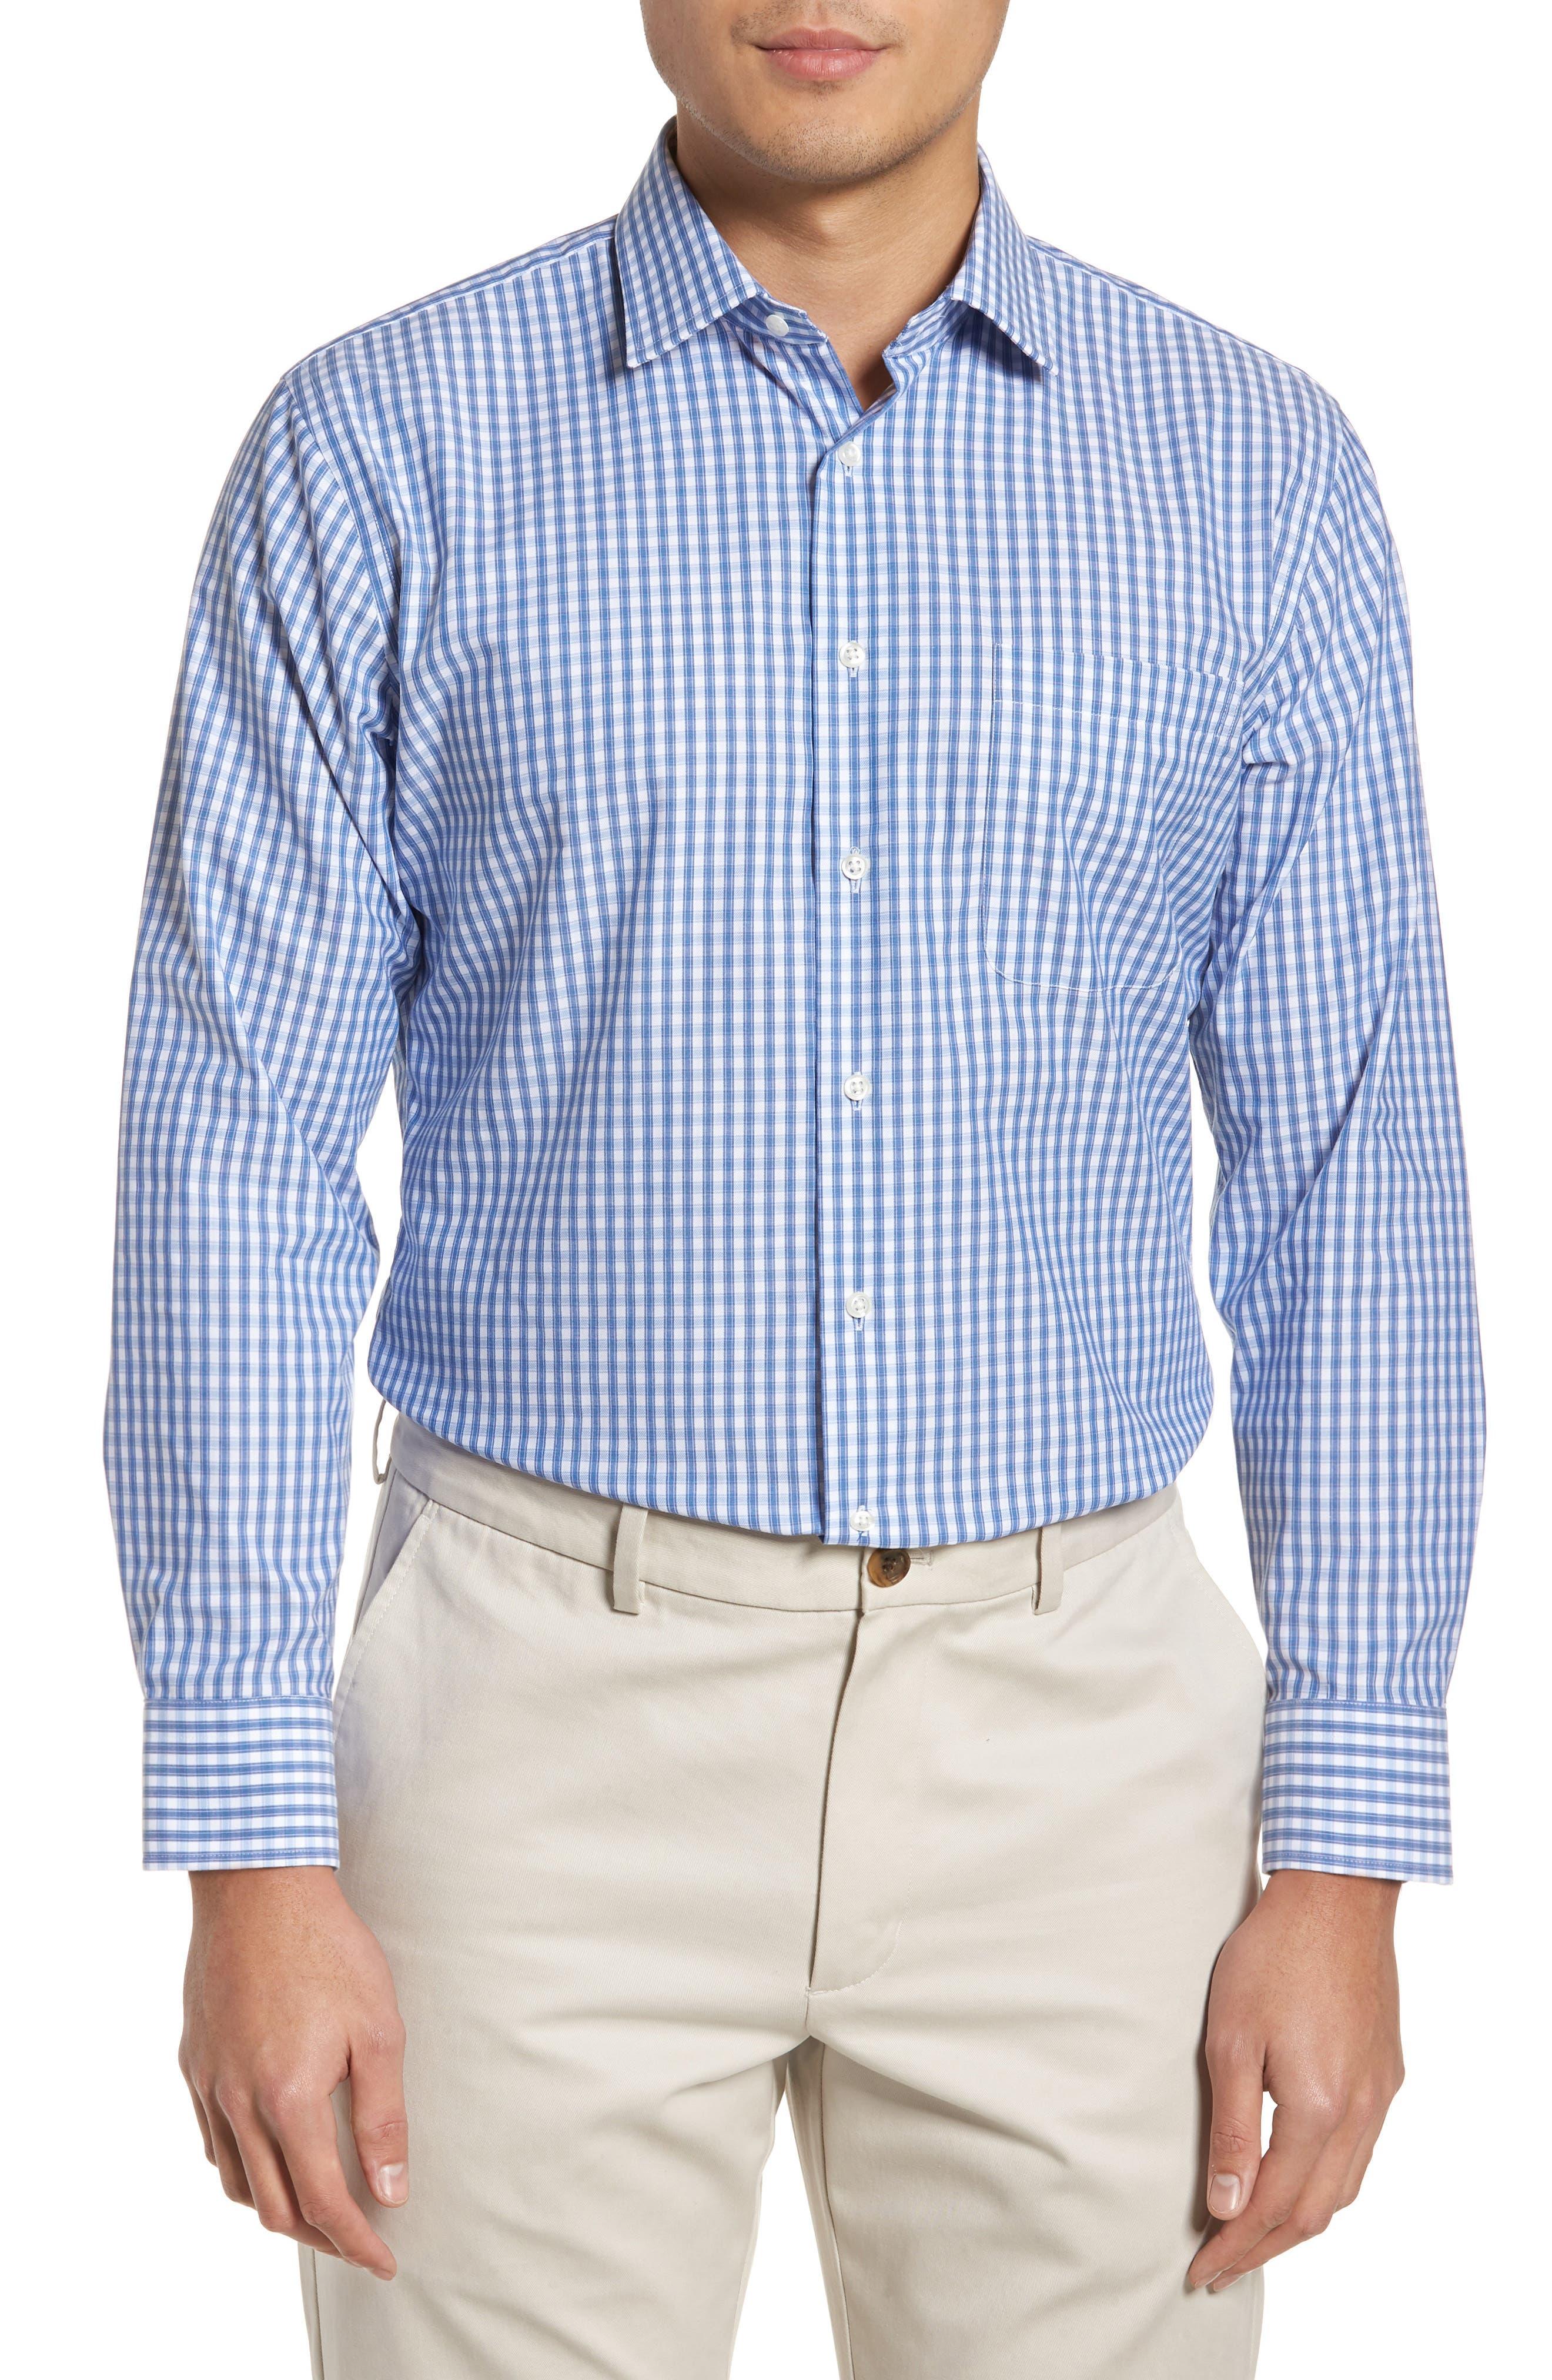 Alternate Image 1 Selected - Nordstrom Men's Shop Trim Fit Non-Iron Check Dress Shirt